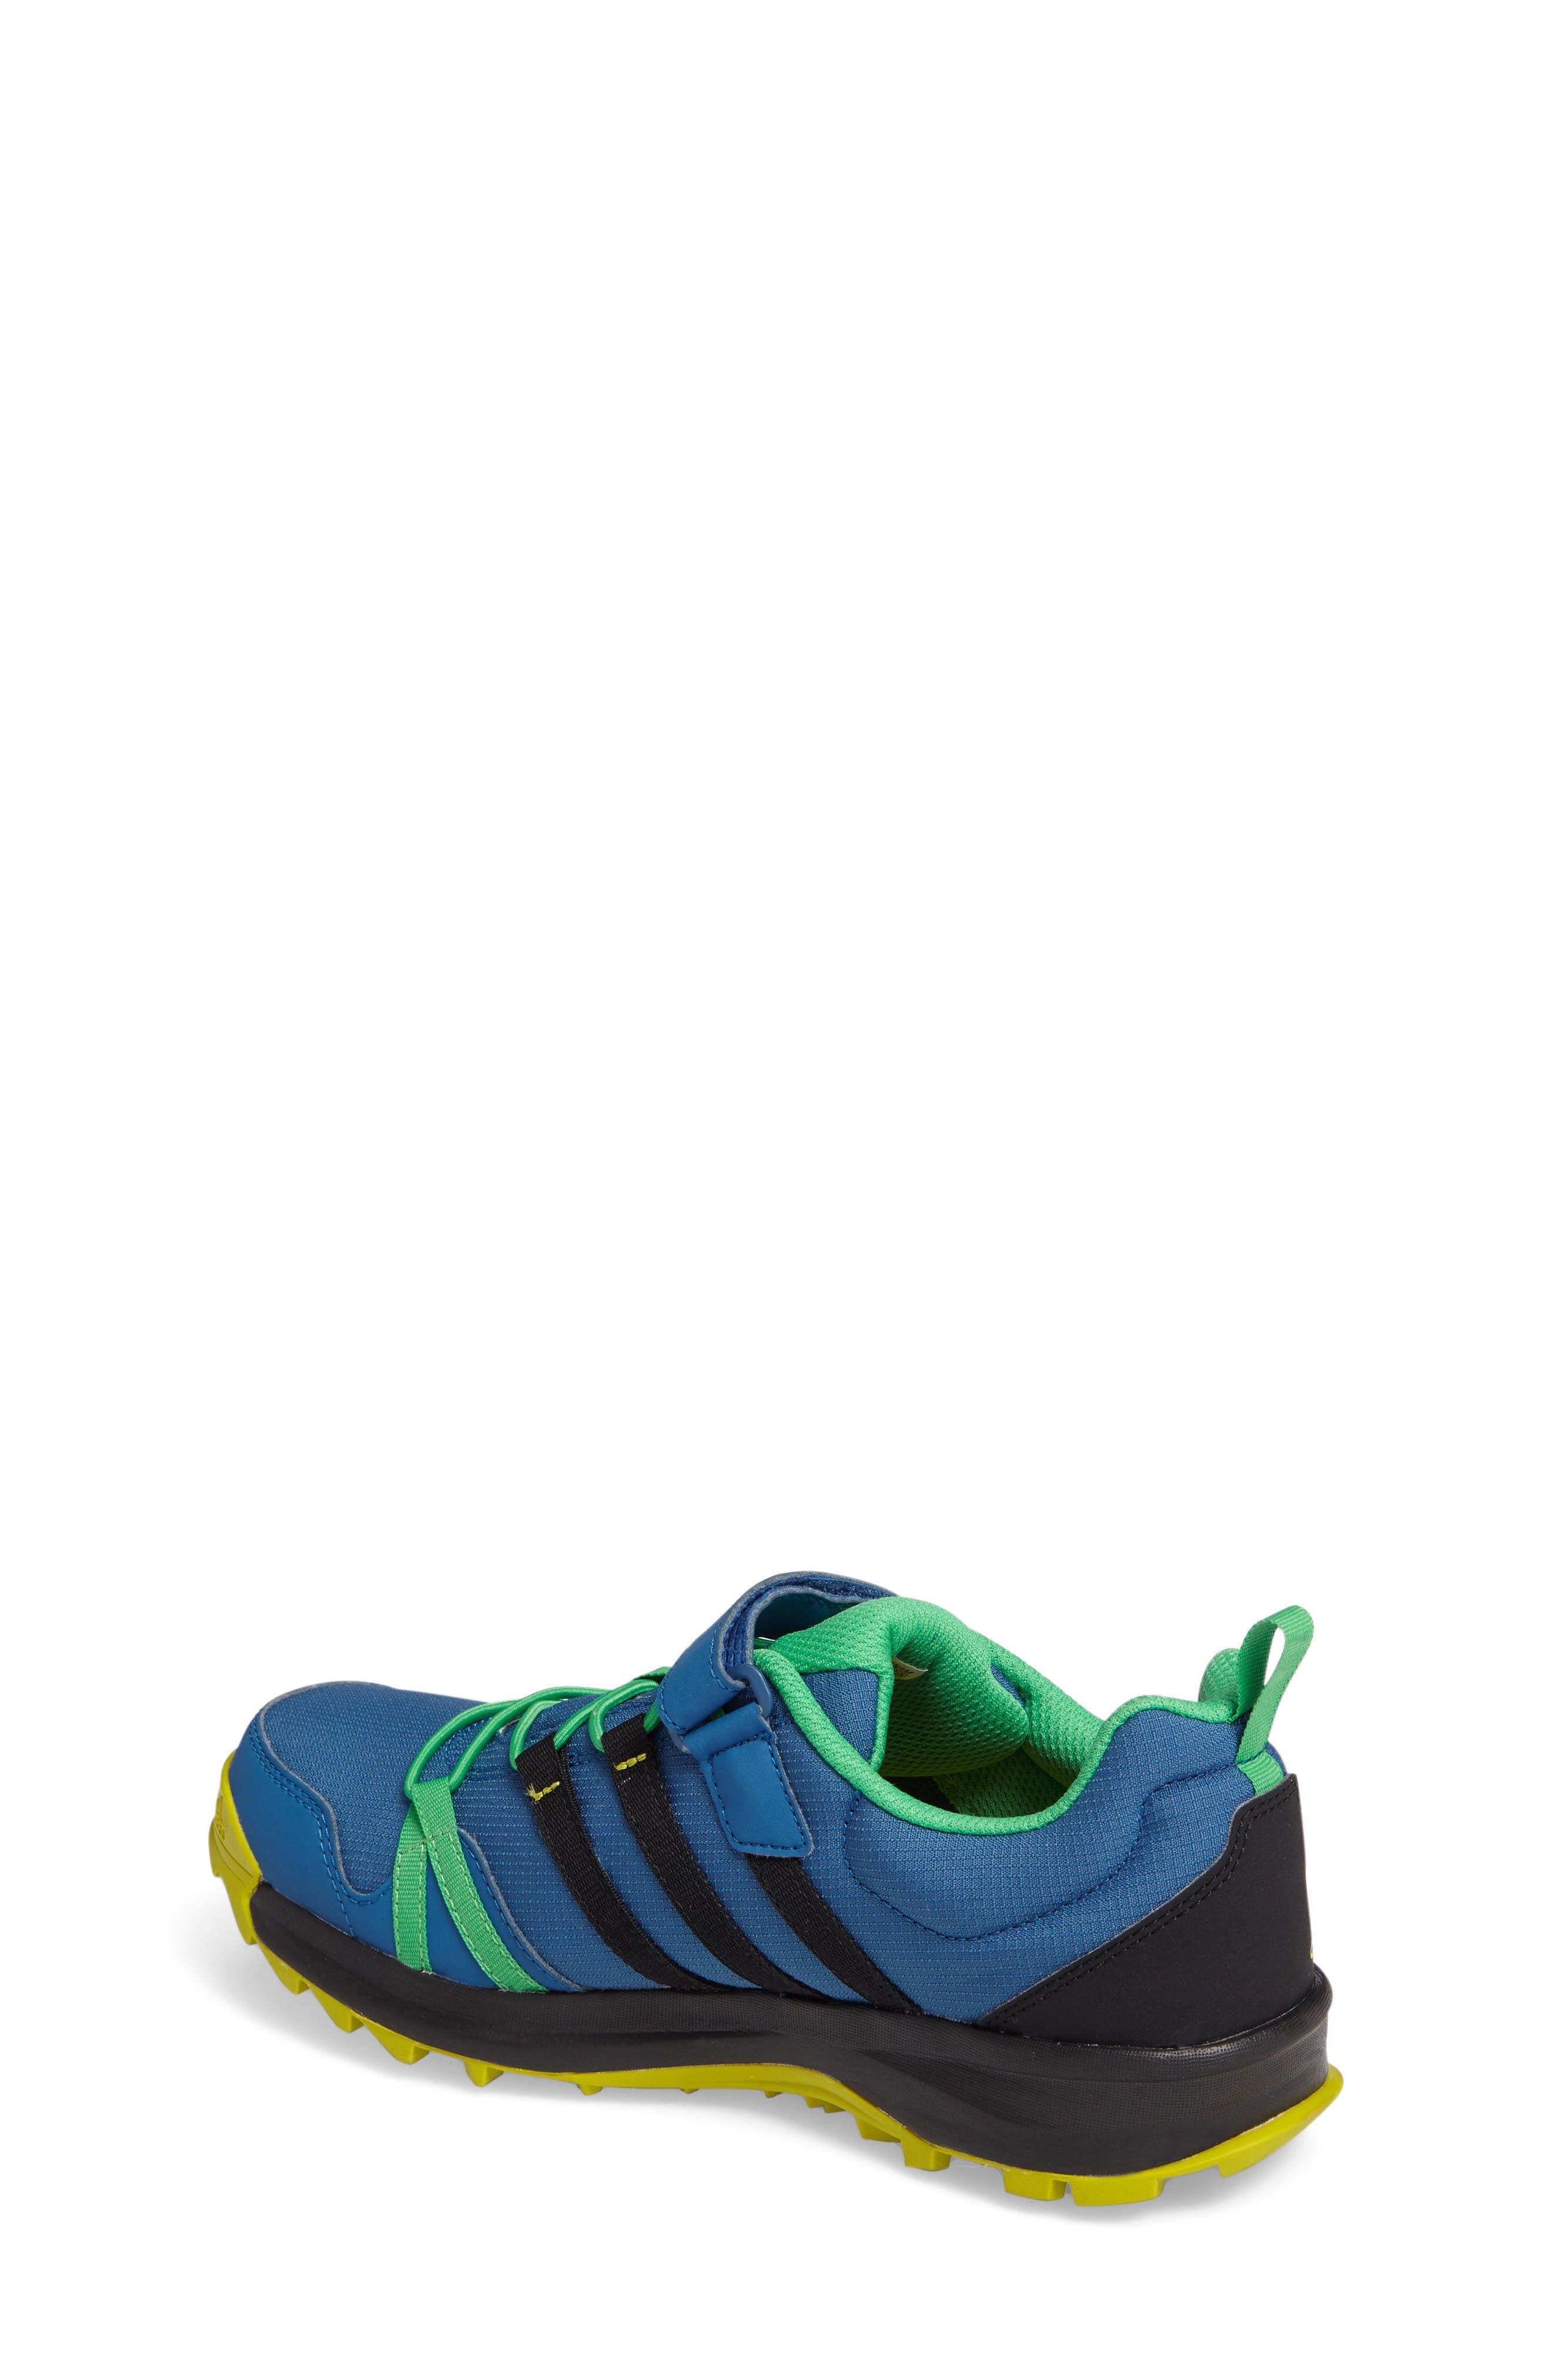 Alternate Image 2  - adidas Tracerocker Sneaker (Toddler, Little Kid & Big Kid)